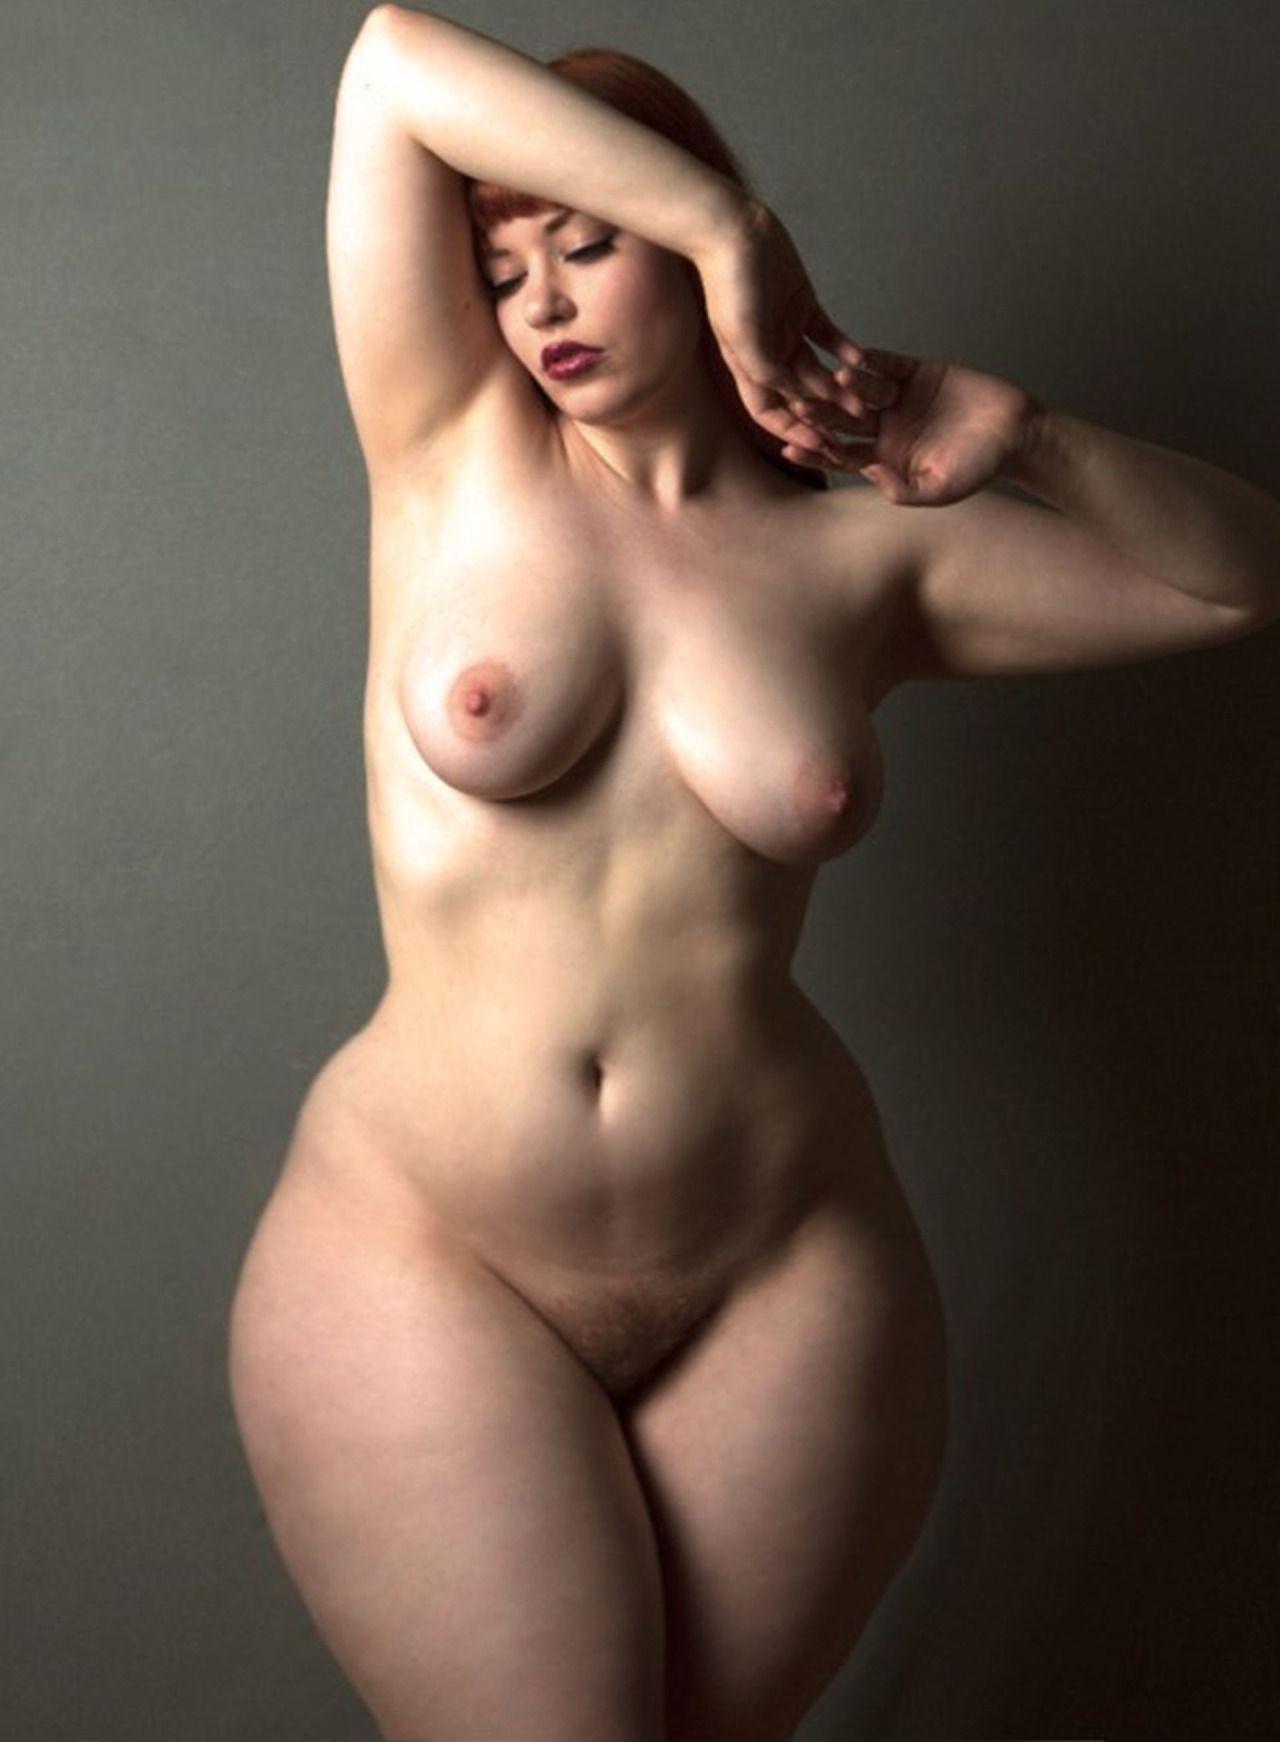 Thick Girl Lover Naked Poses Sensual Daily Photo Big Boop Full